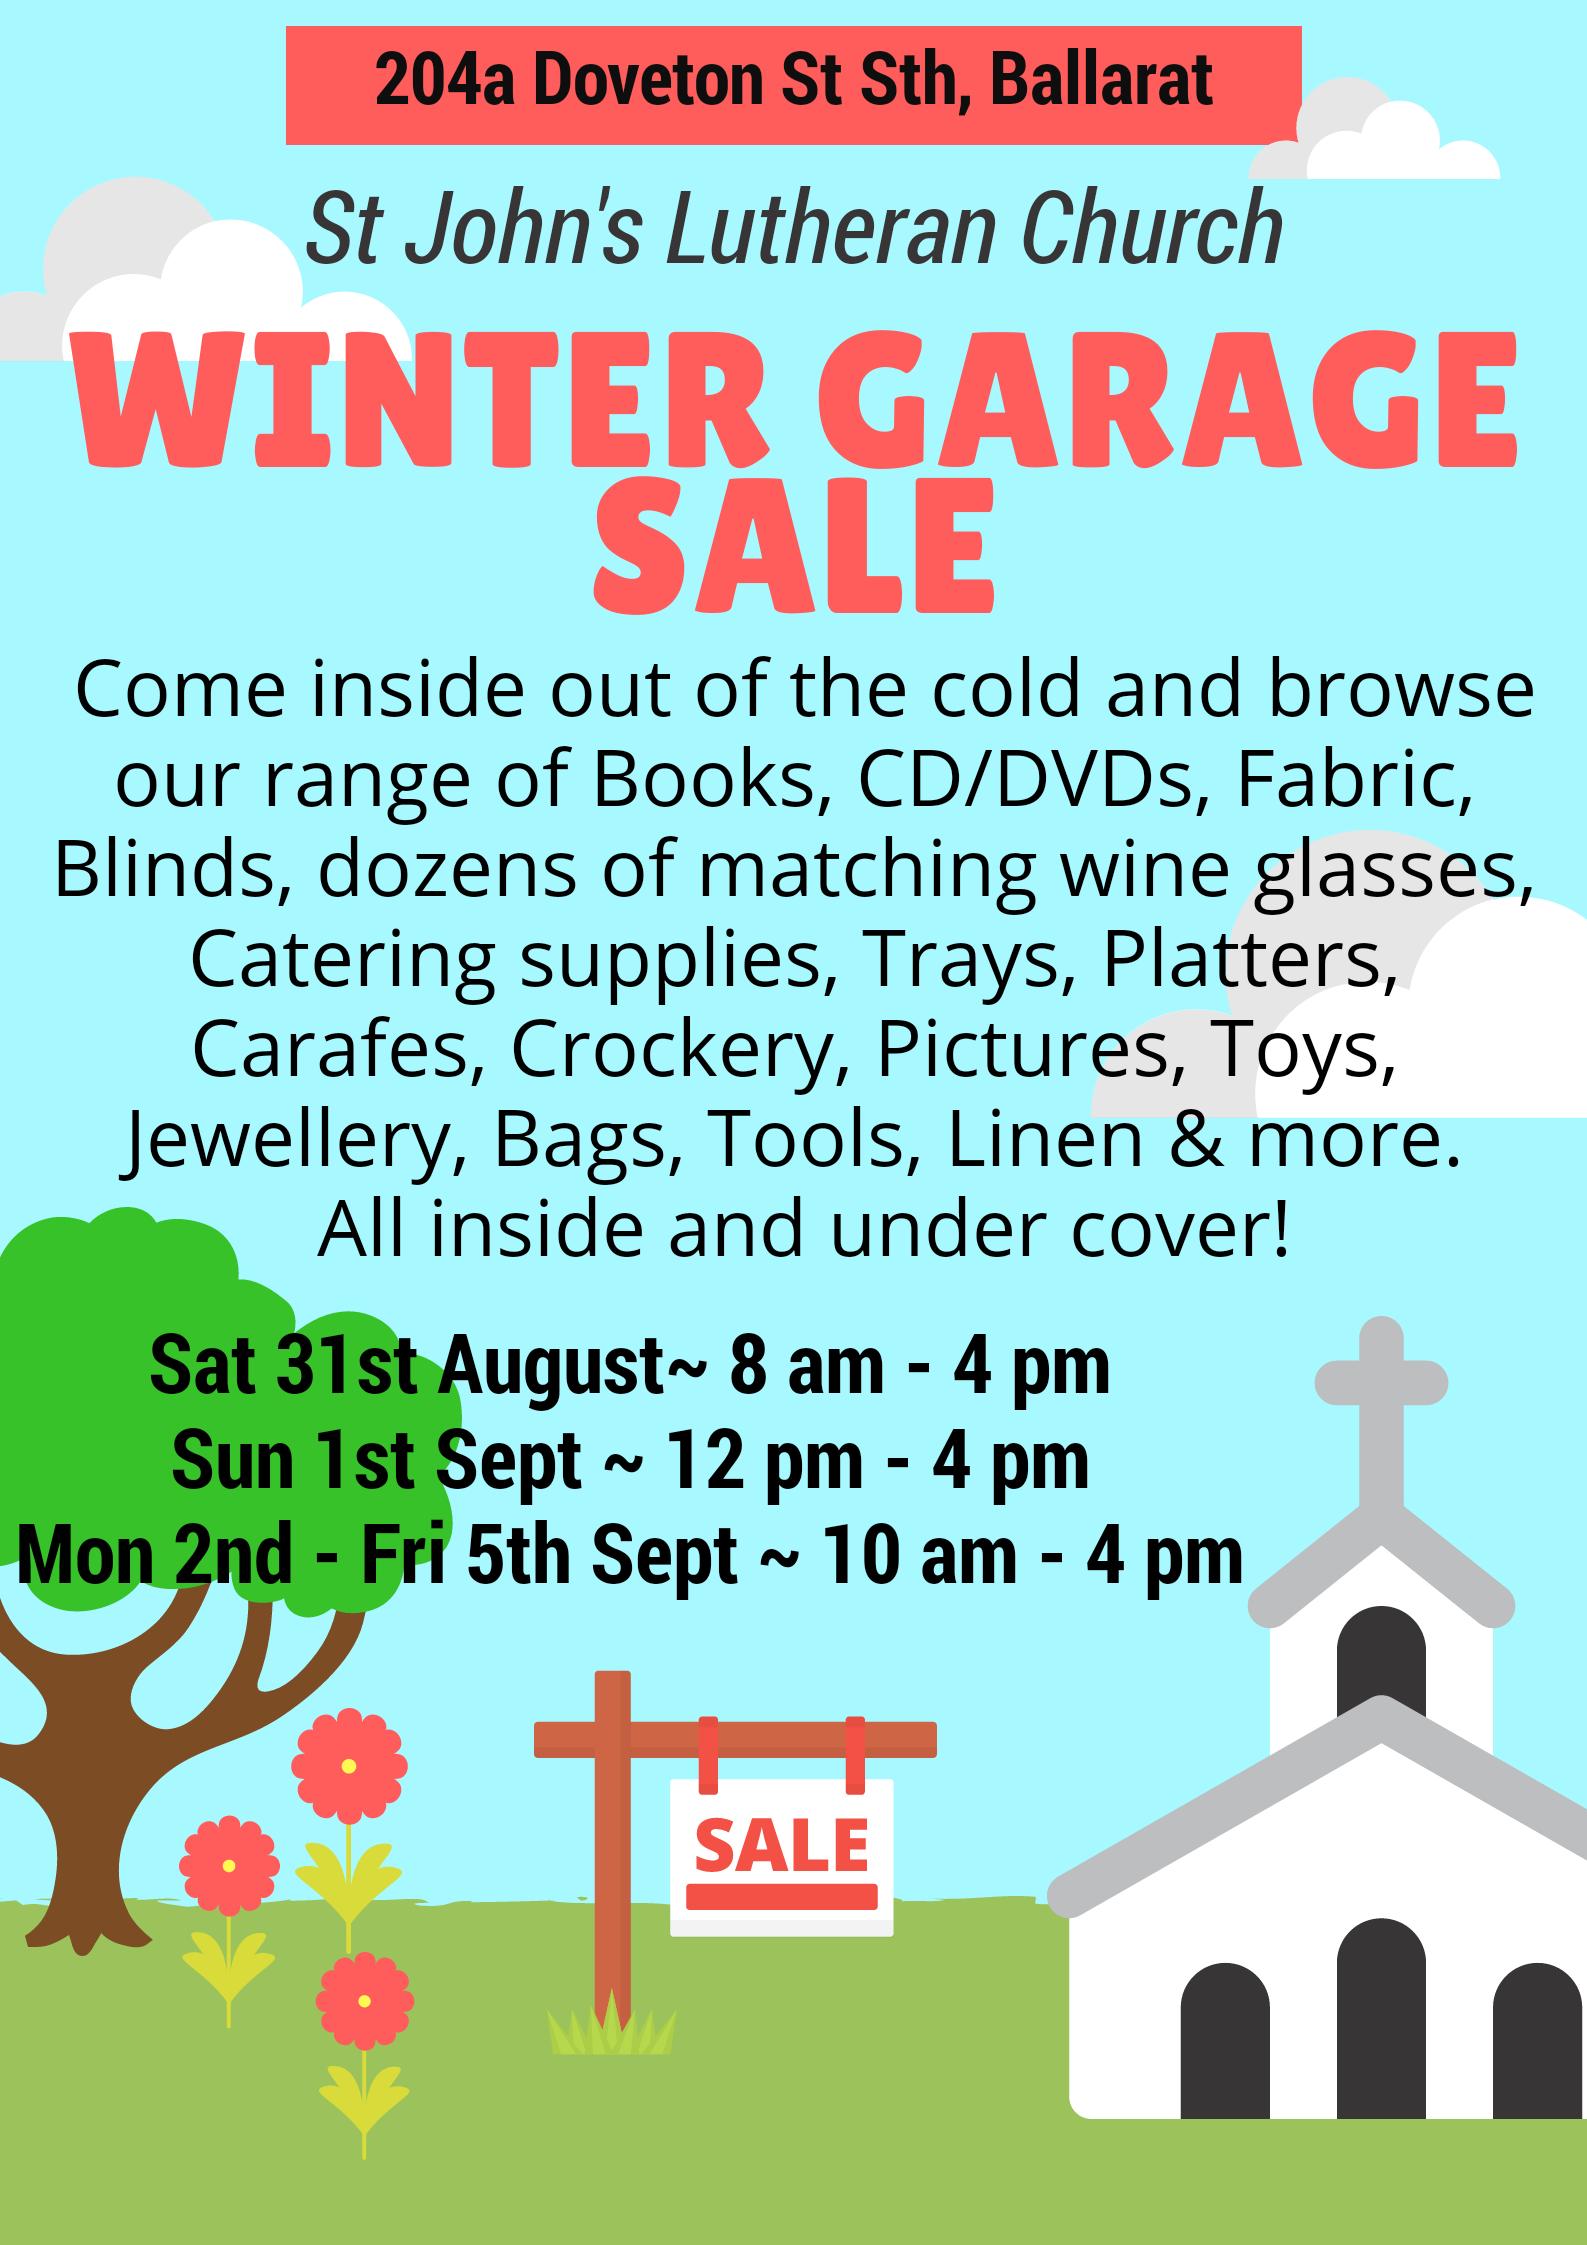 St John's Lutheran Church Winter Garage Sale - What's On - Power FM